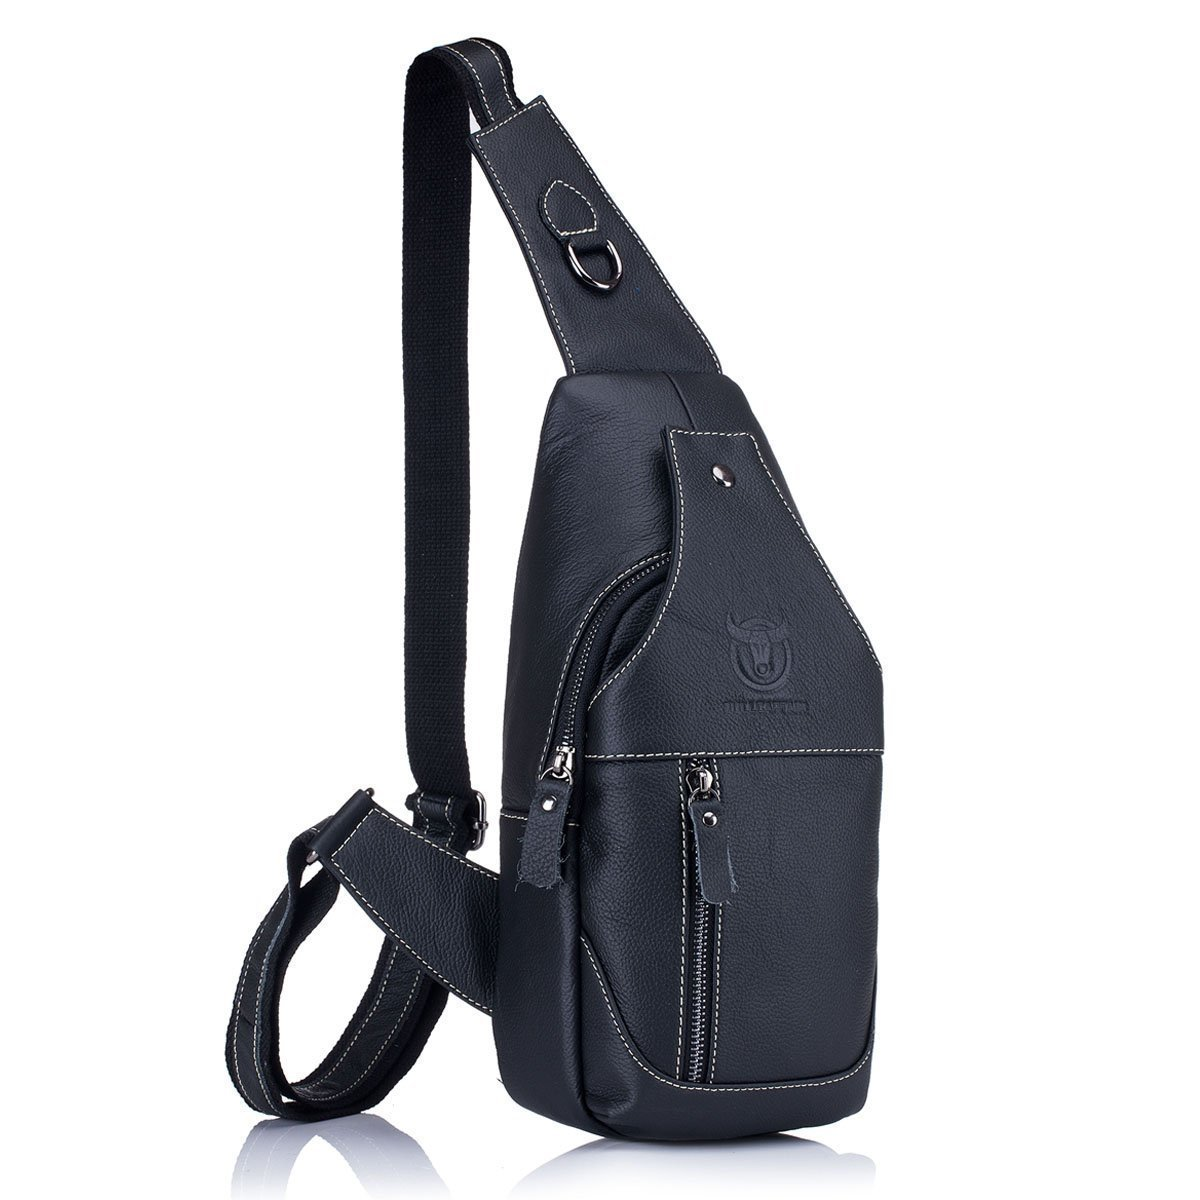 ebd4fbde06df Sling bag Men Genuine Leather Chest Bag ELASZ Men s Pendant Bags Bust Bags  Wallet Anti-theft Hiking Travel Hiking School (Black-019)  Amazon.co.uk   Shoes   ...